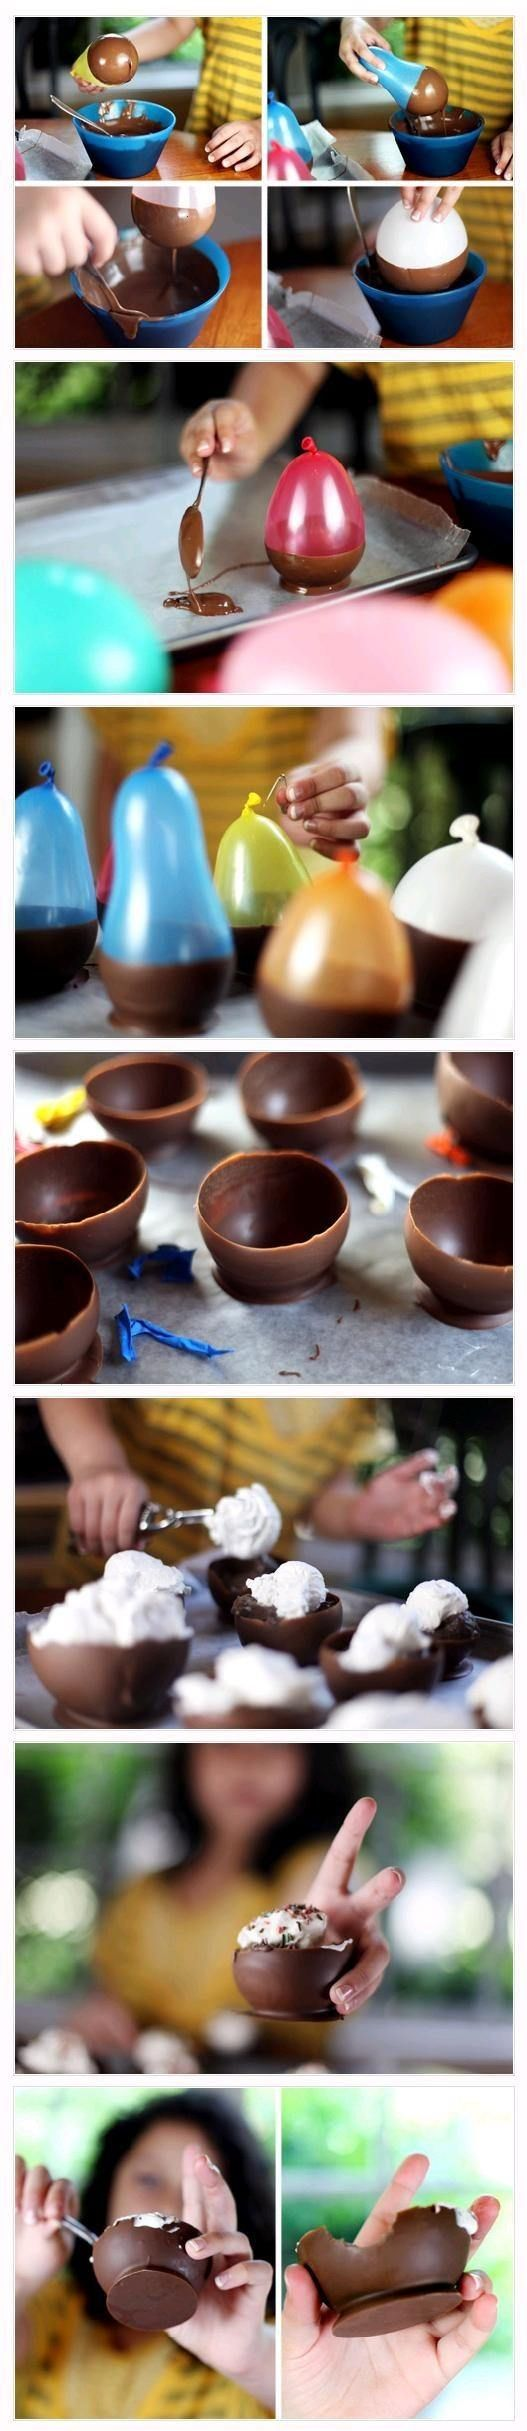 yum chocolate; this is how I make my choc. bowls too :)